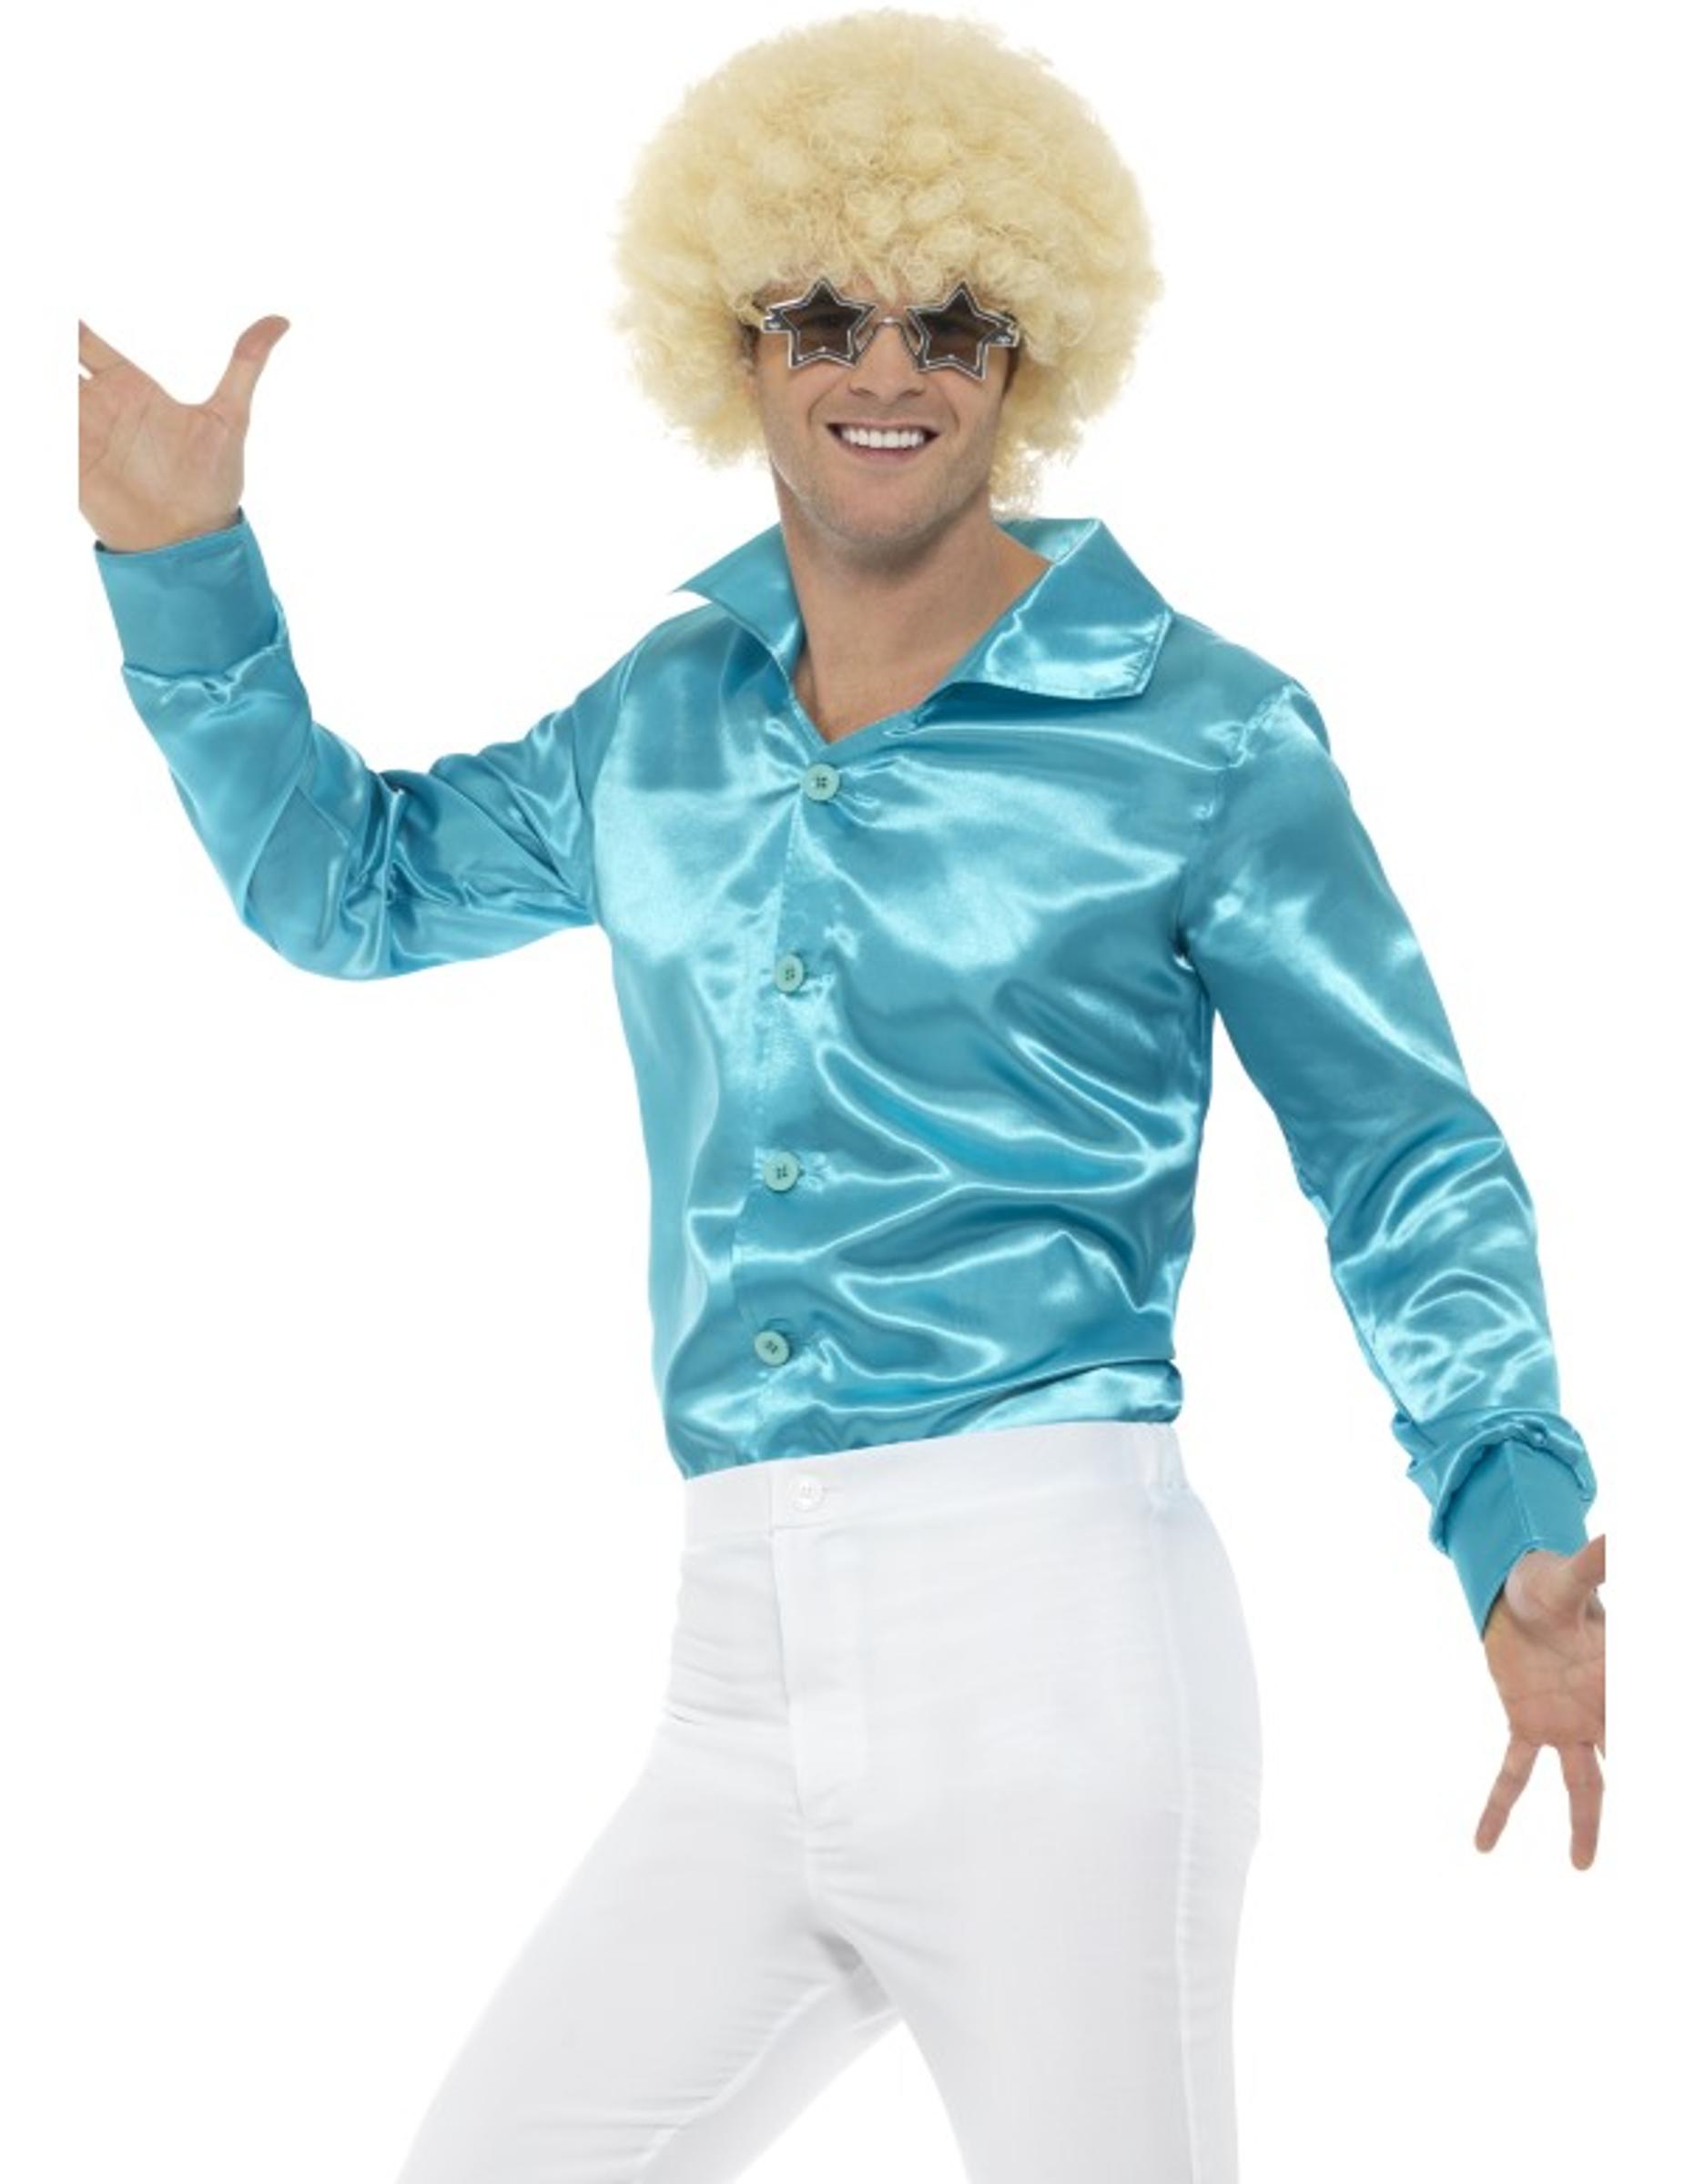 764bf95aa0fcd Camisa satinada turquesa hombre  Disfraces adultos